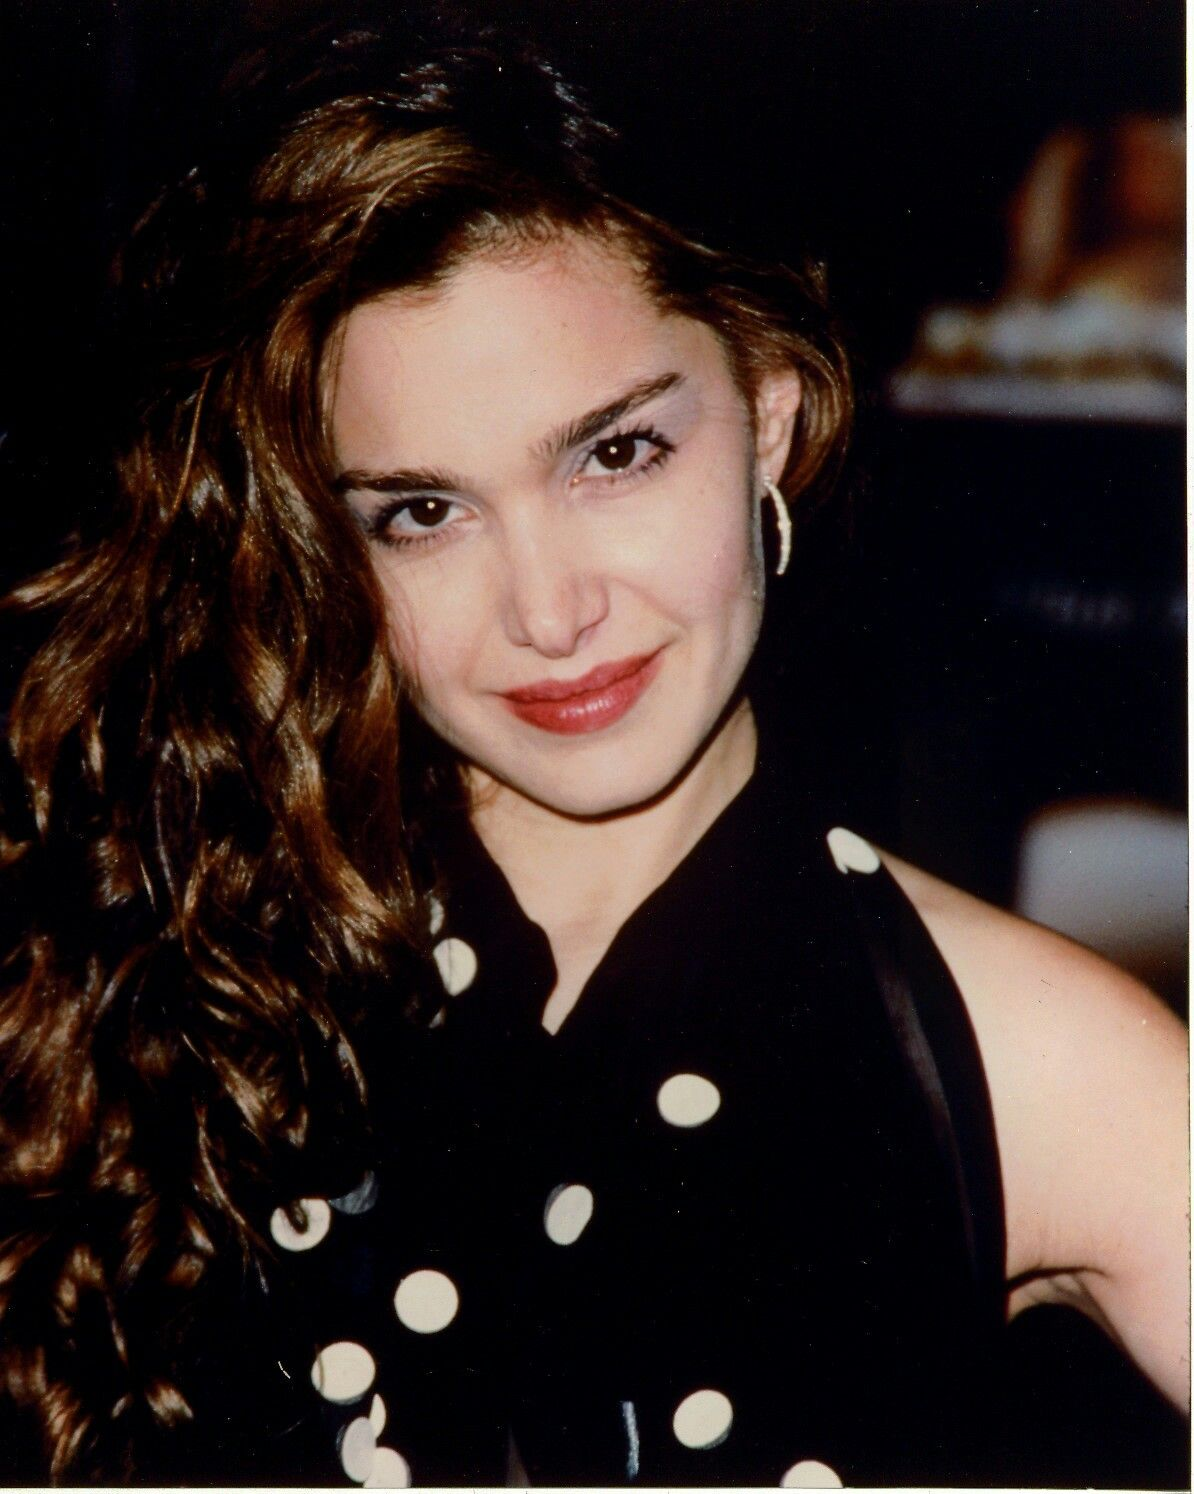 Yara Khmidan UKR Adult archive Erin Wasson,Ben Barnes (born 1981)